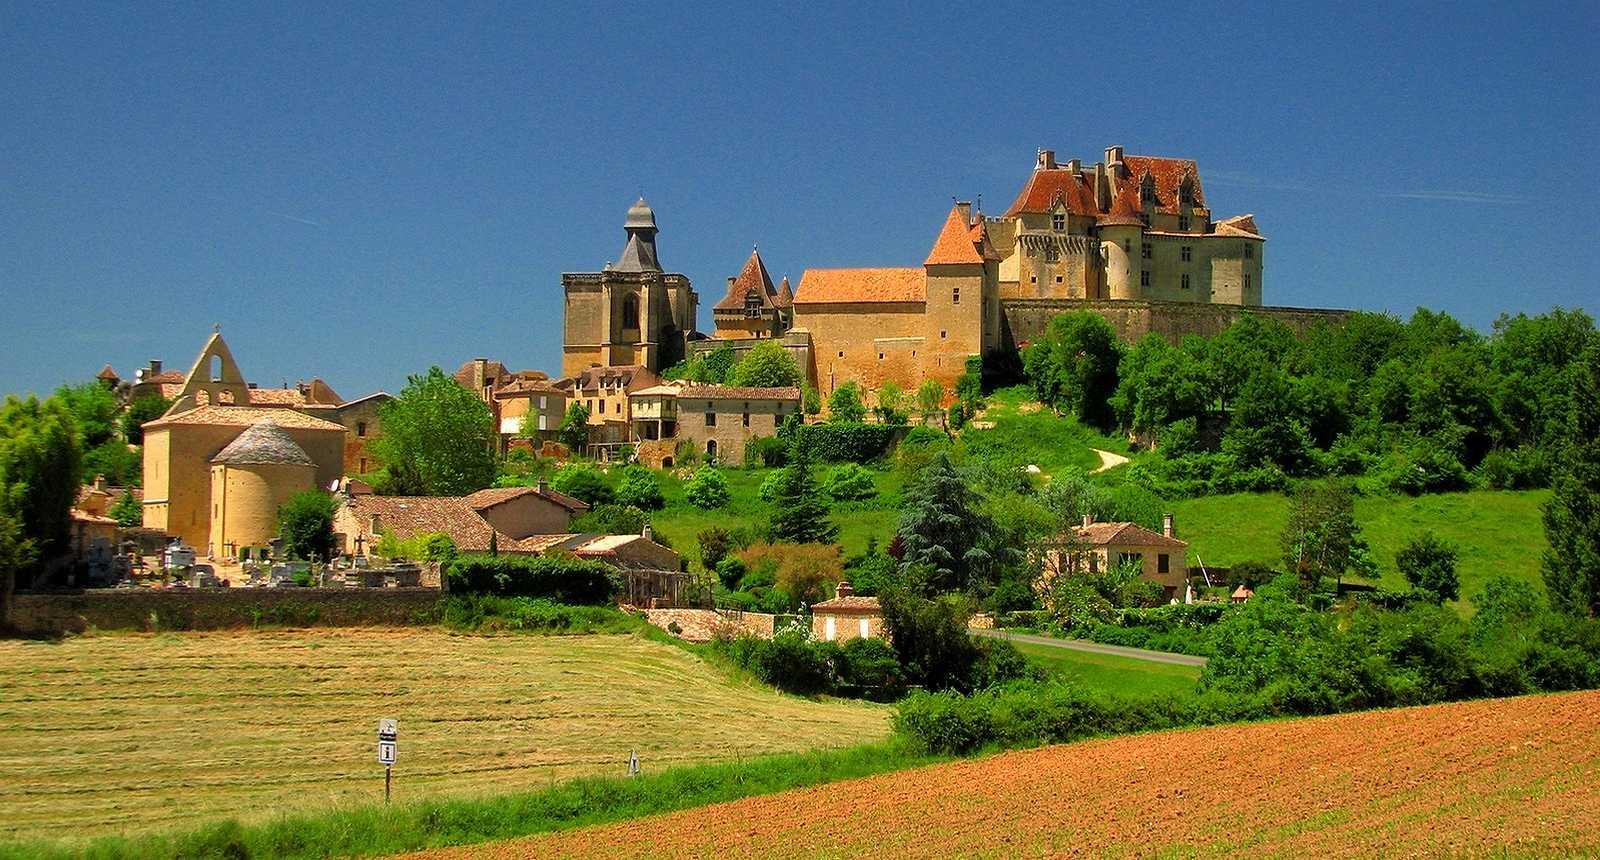 Image : Château de Biron